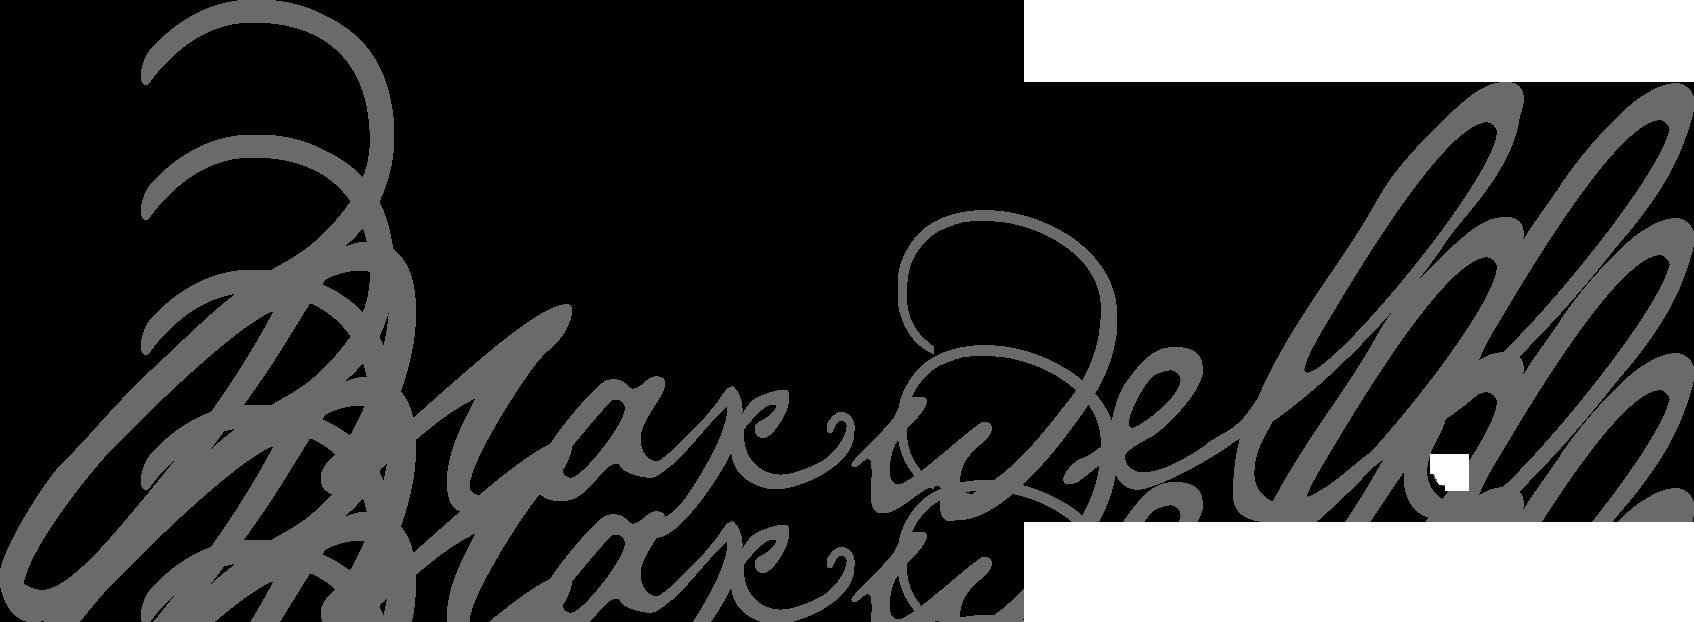 maxwell-script-darkgrey